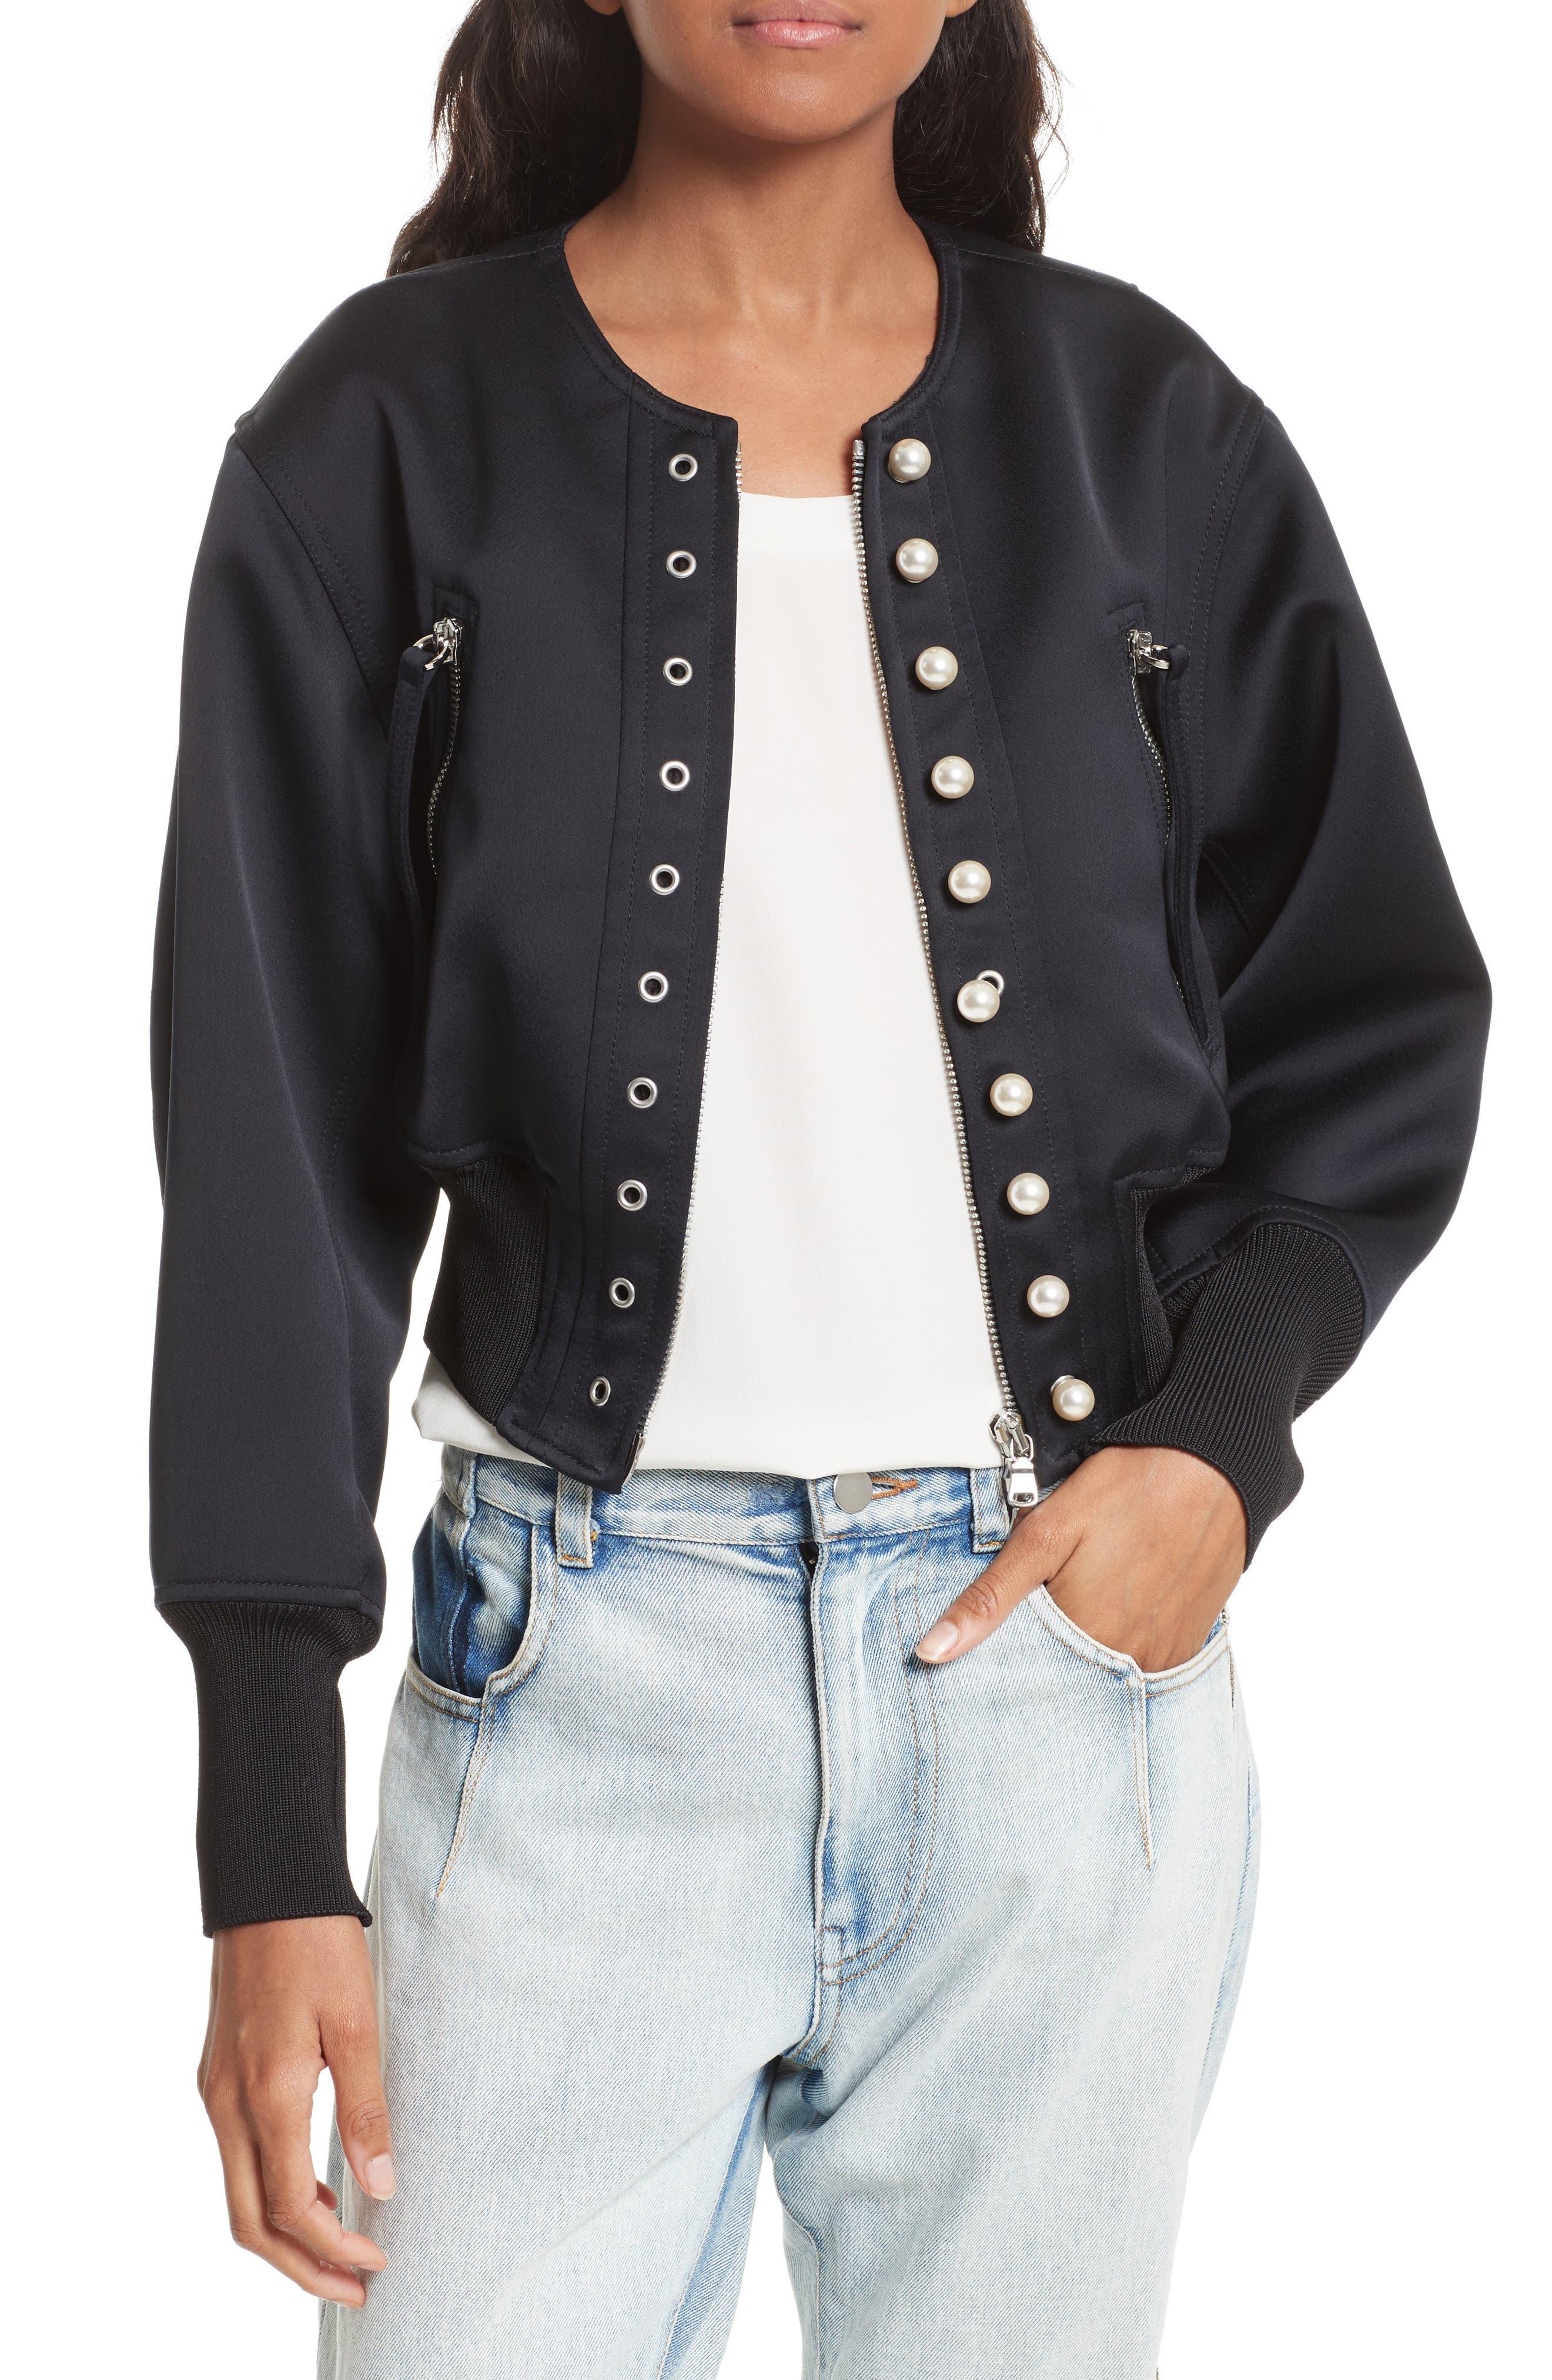 Main Image - 3.1 Phillip Lim Grommet & Faux Pearl Embellished Bomber Jacket